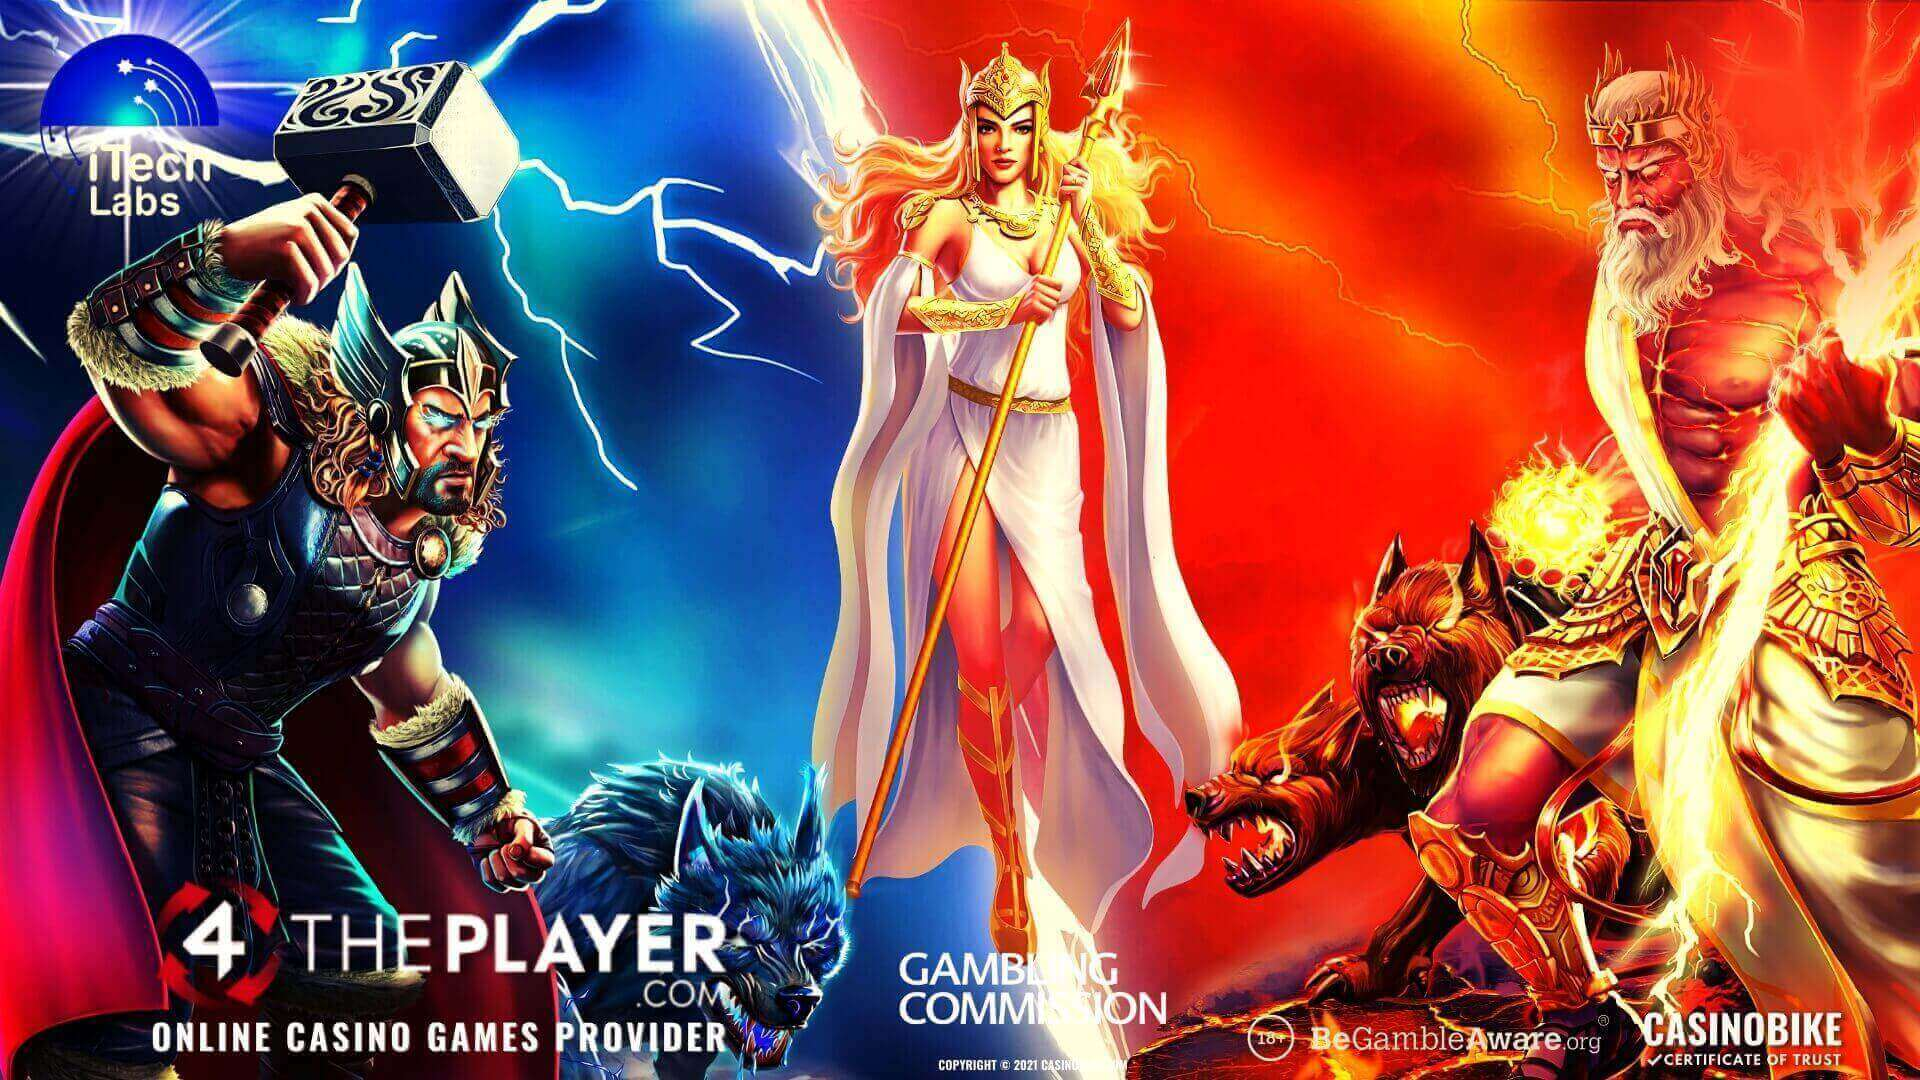 4ThePlayer Online Casino Games Provider